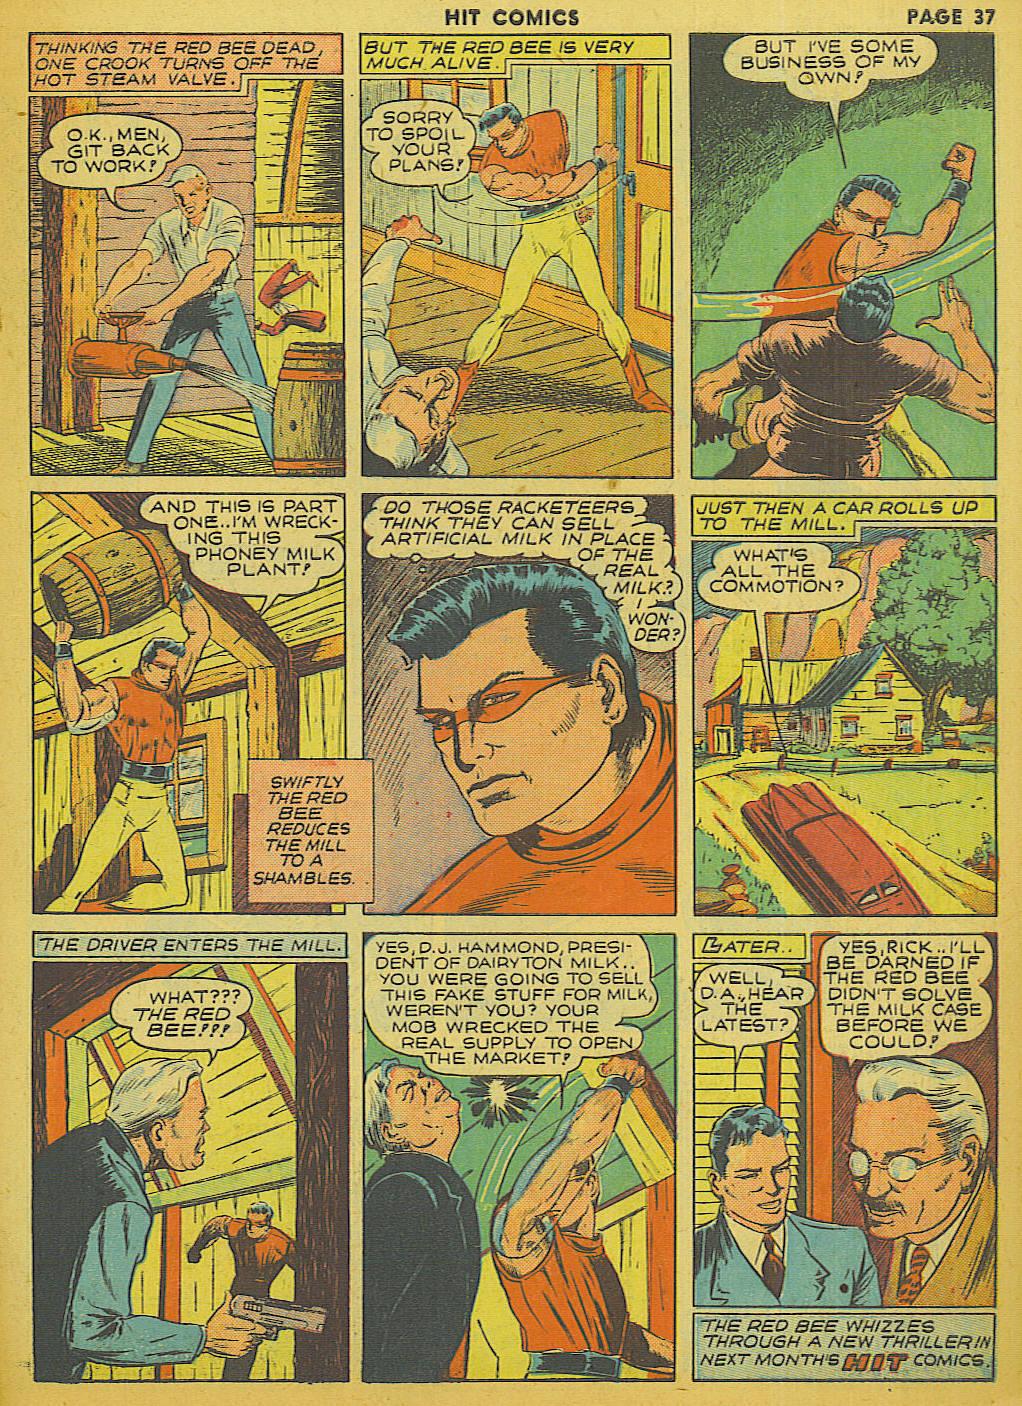 Read online Hit Comics comic -  Issue #13 - 39